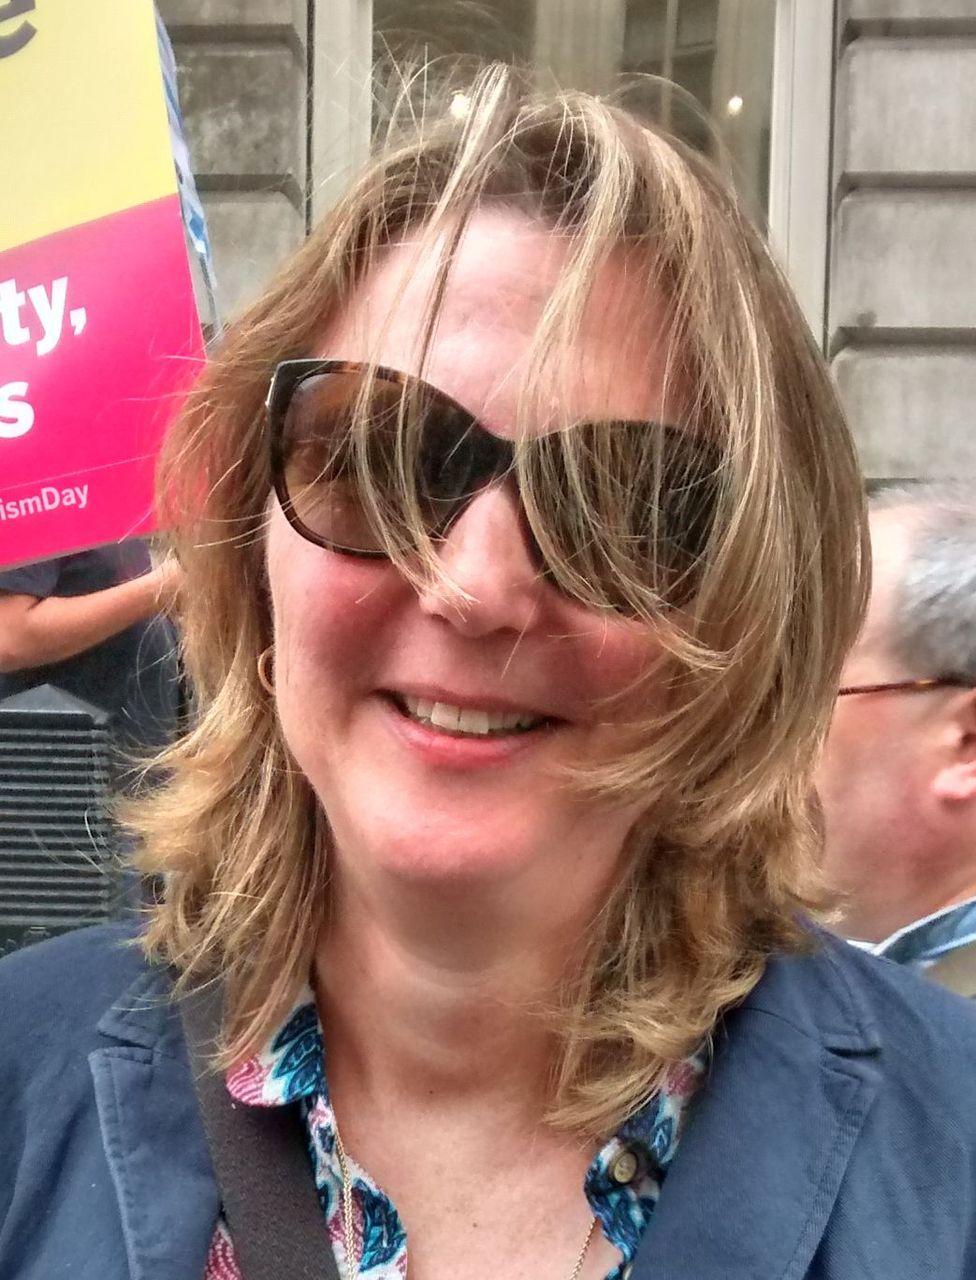 Laura, 1 July London anti-Theresa May demonstrator